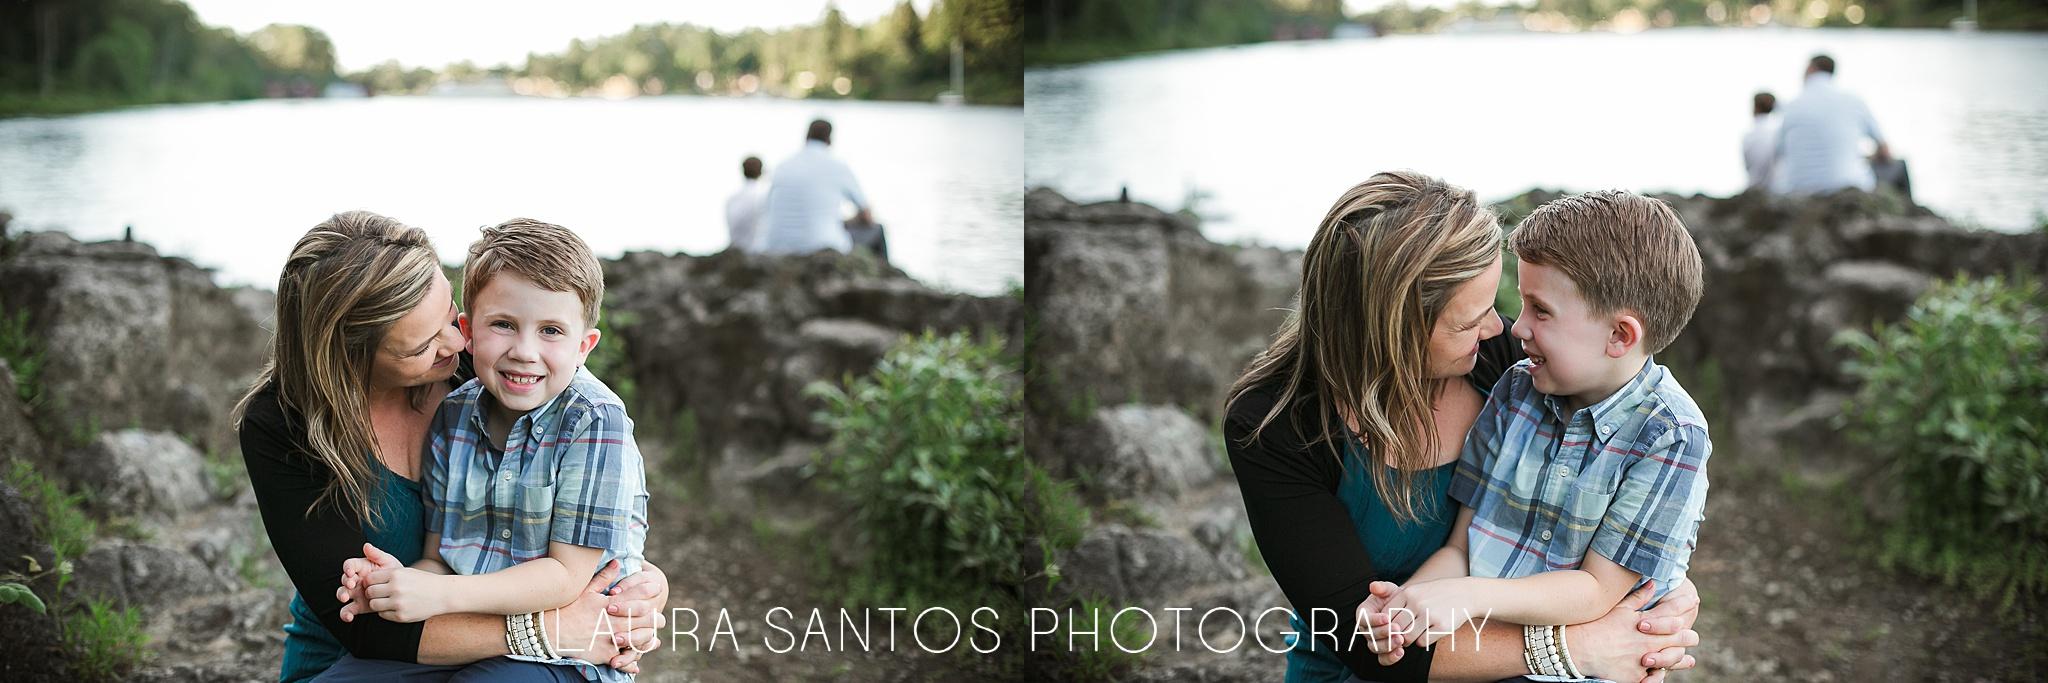 Laura Santos Photography Portland Oregon Family Photographer_1007.jpg